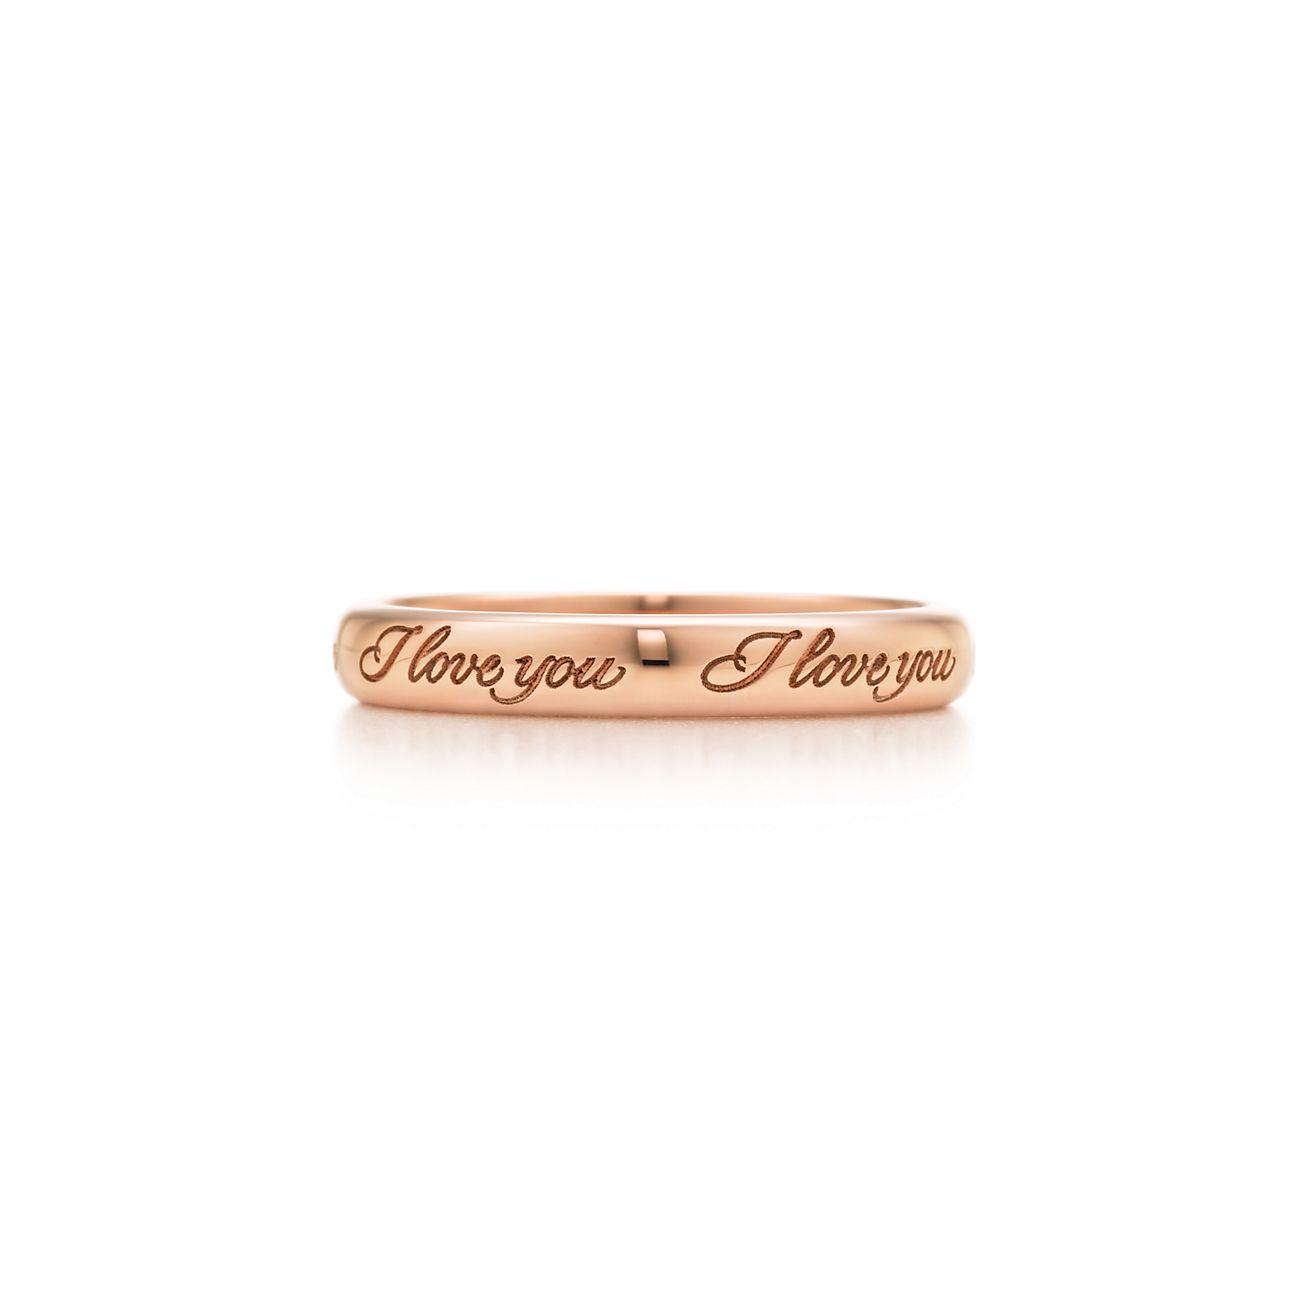 Tiffany Notes Band Ring Price